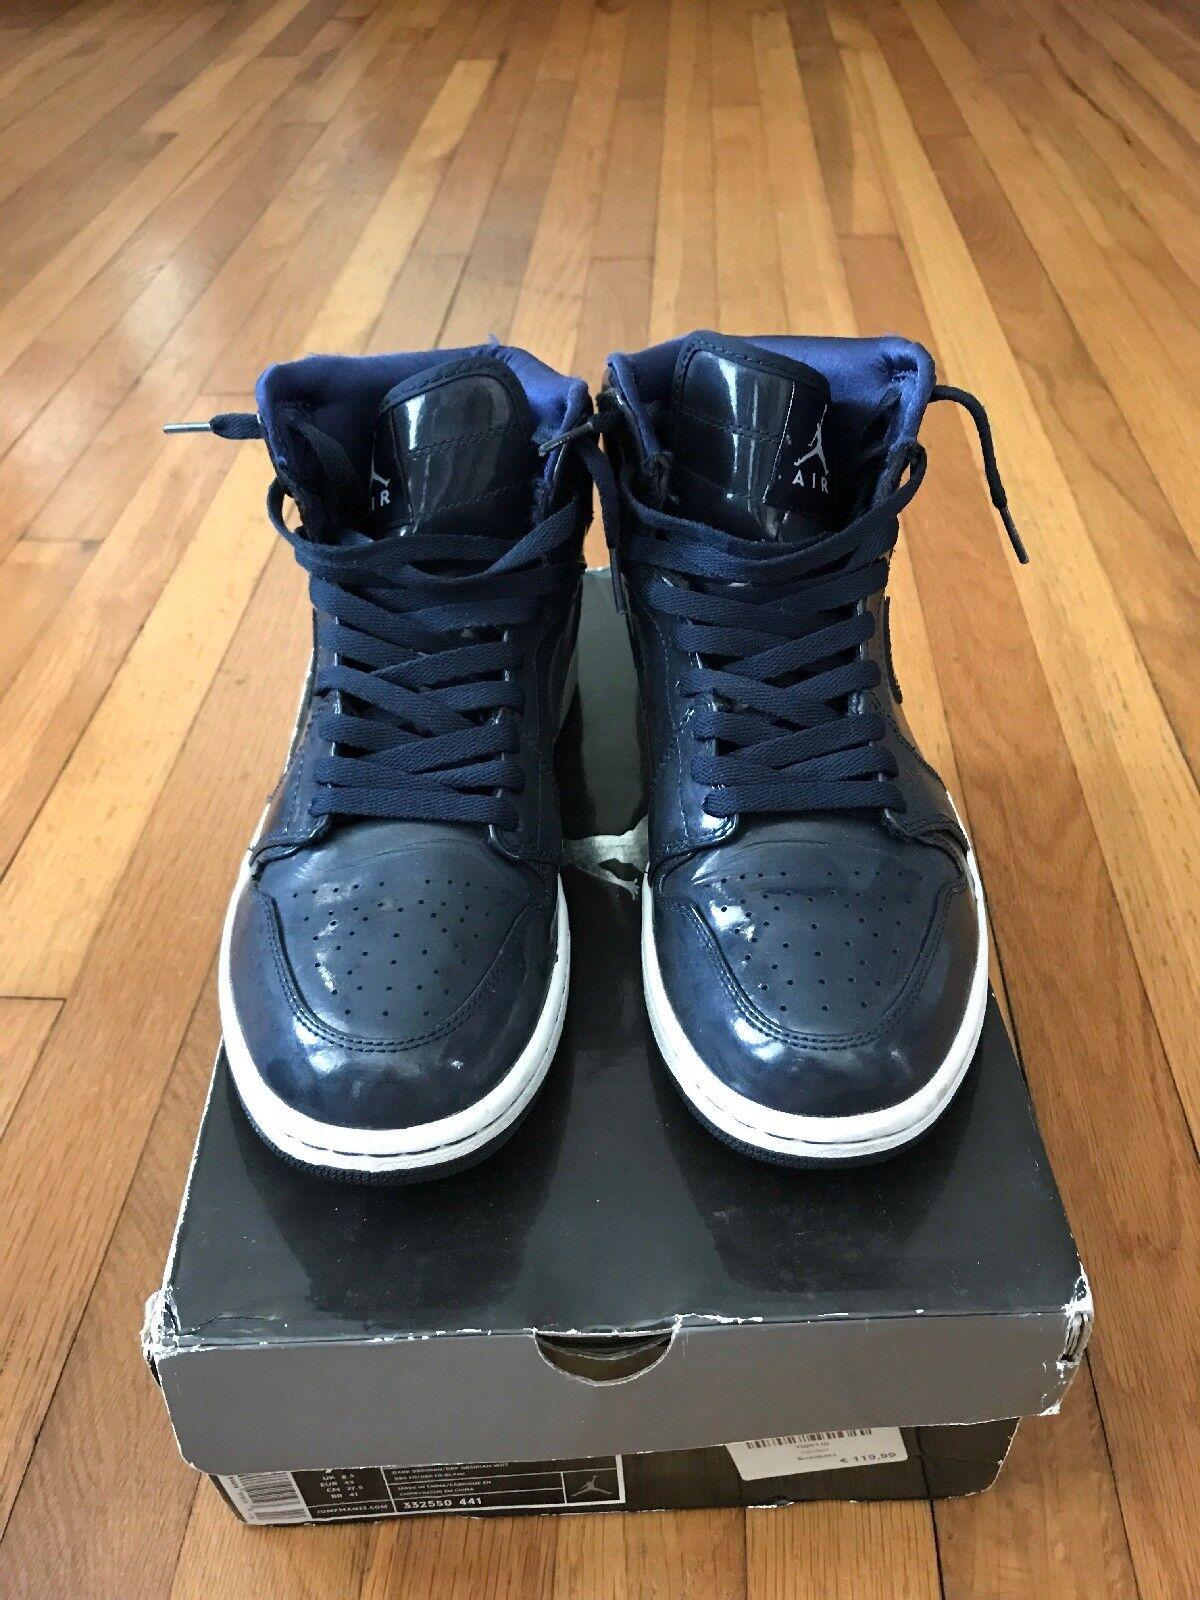 Nike Men's Air Jordan 1 Retro Sneakers - Size 9.5 US, Patent Leather bluee